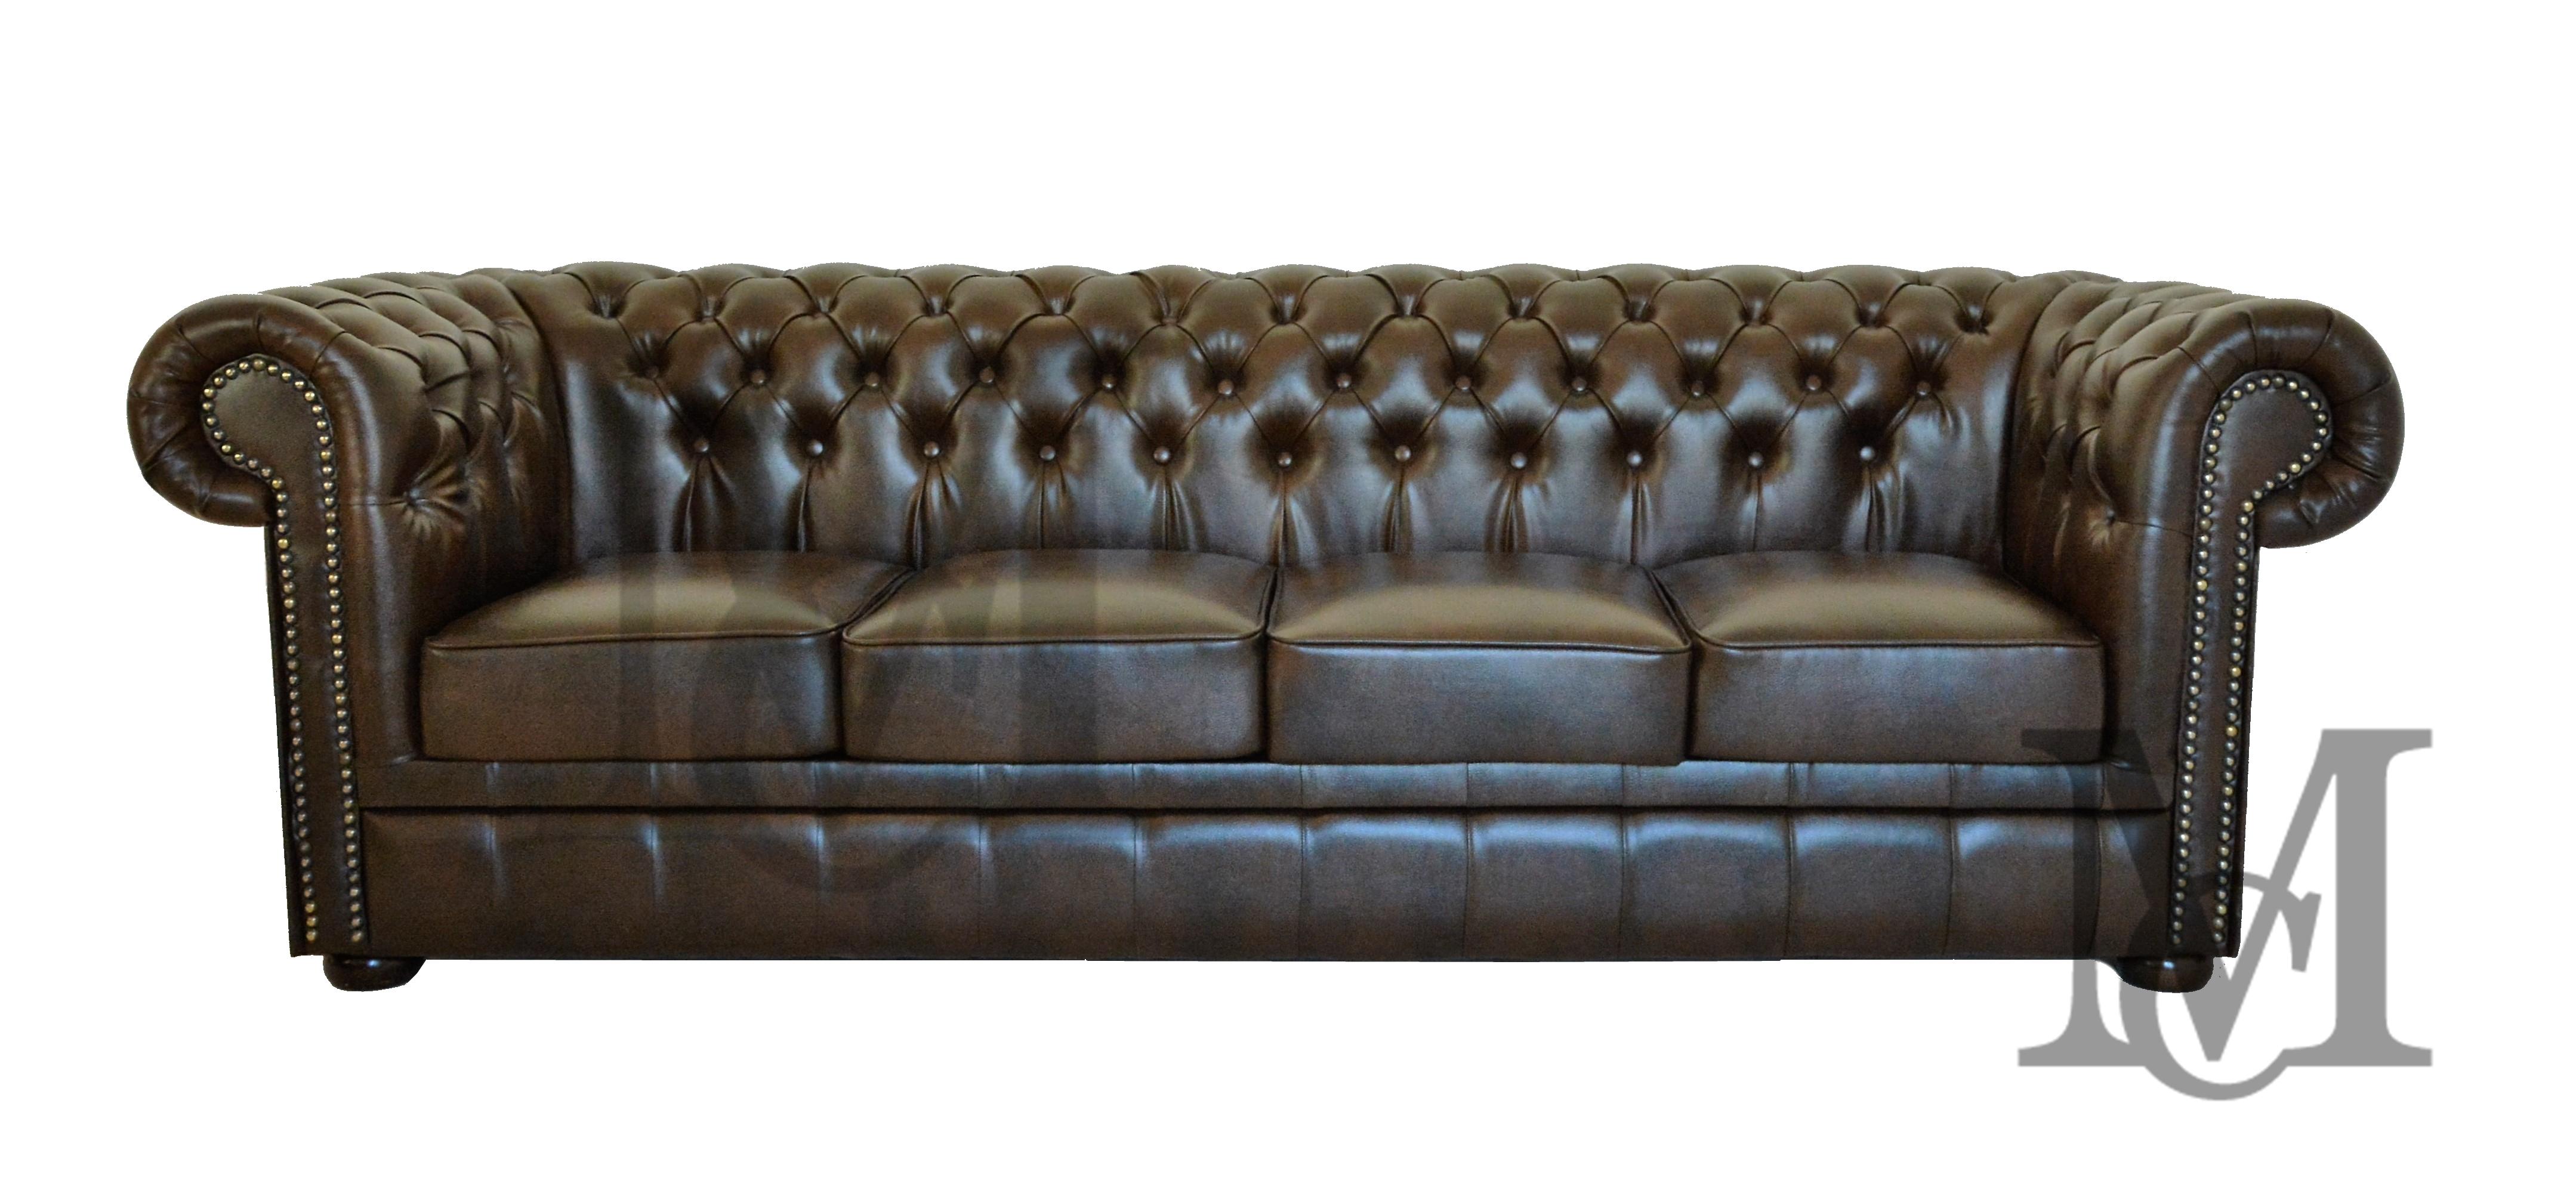 Sofa Classic Chesterfield 4 Osobowa Skora Naturalna Pikowana Sofa